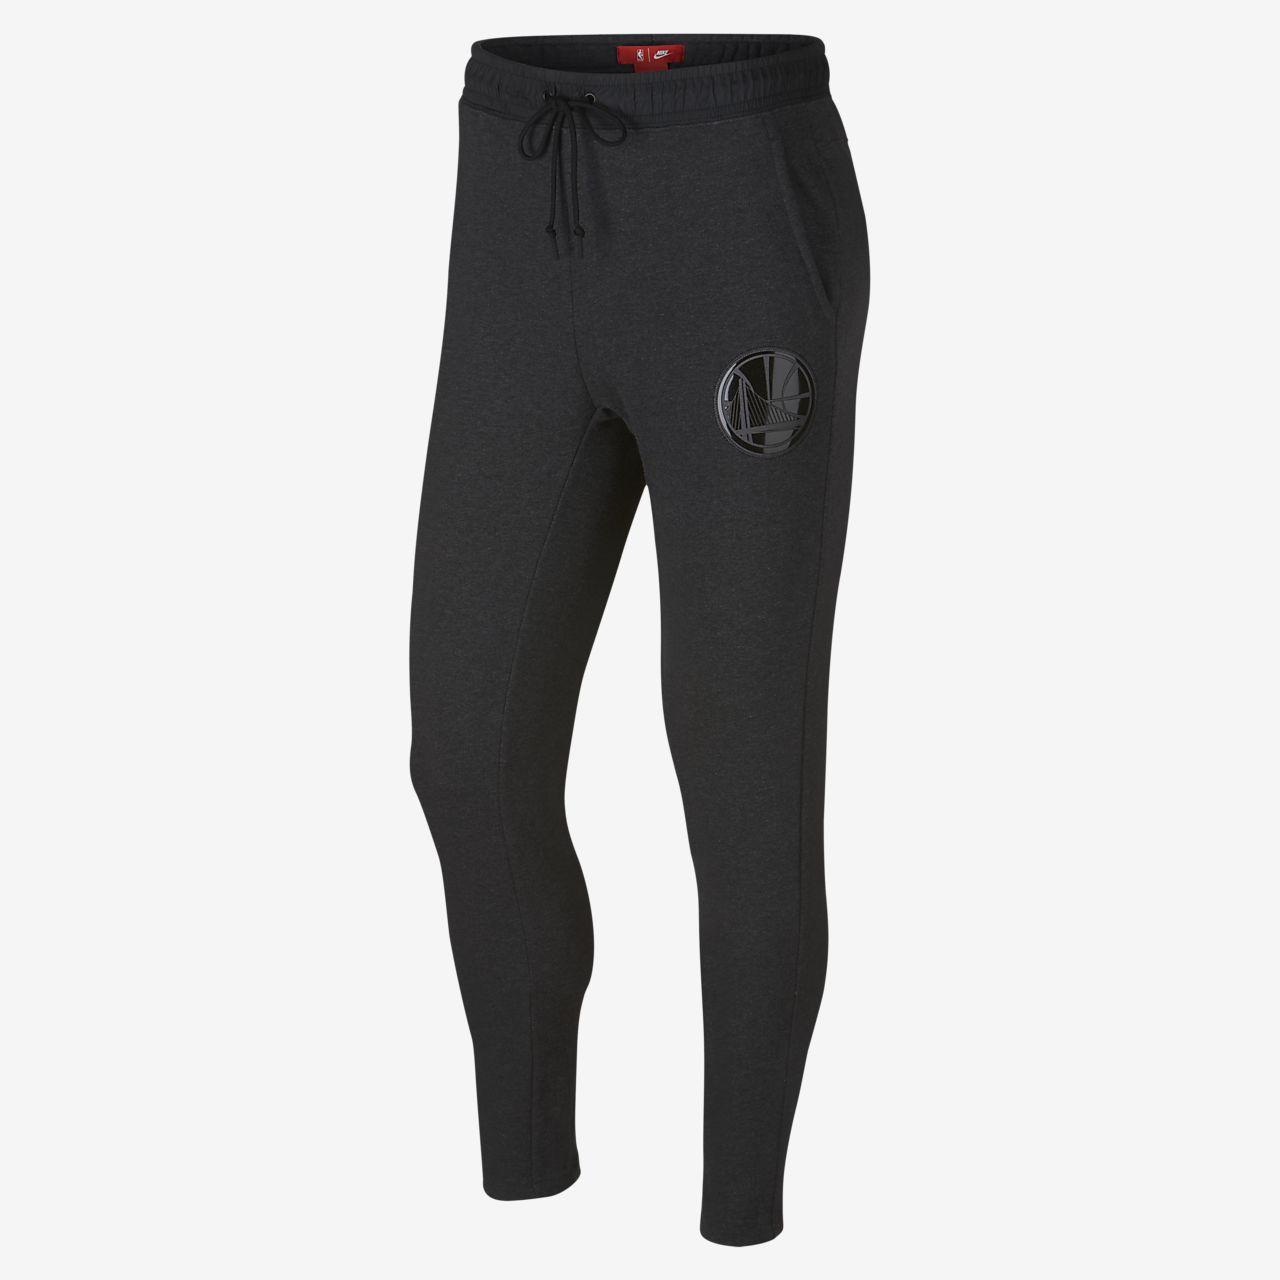 ... Golden State Warriors Nike Modern Men's NBA Pants